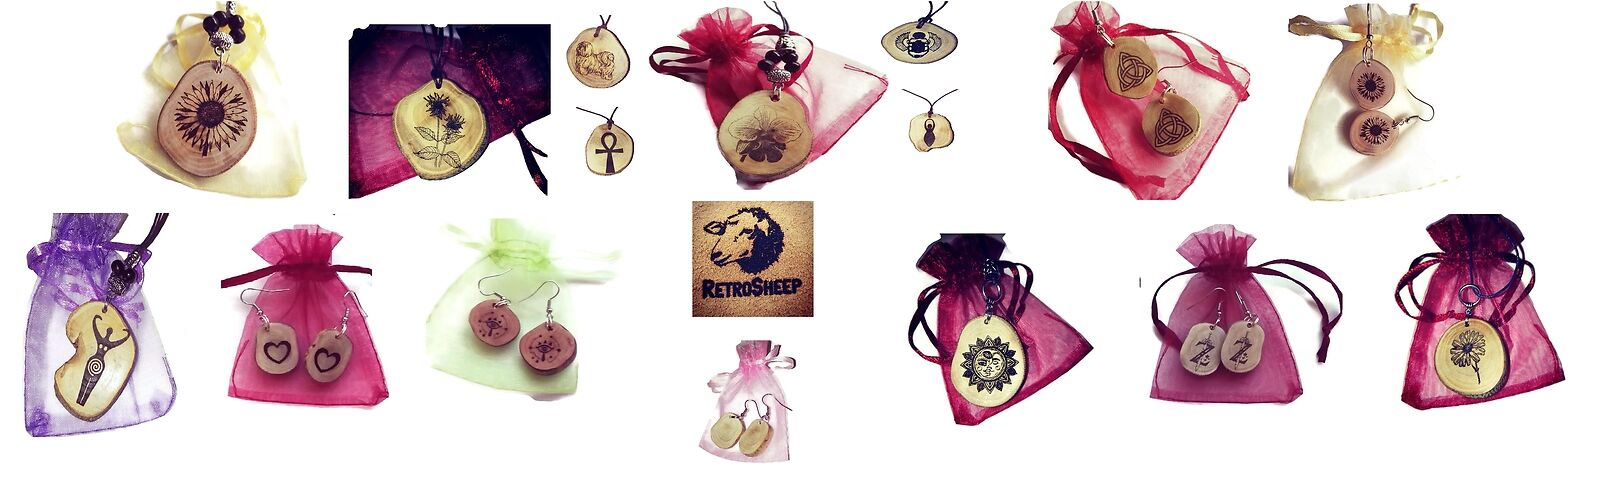 Handmade Personalised Gifts #Ebay